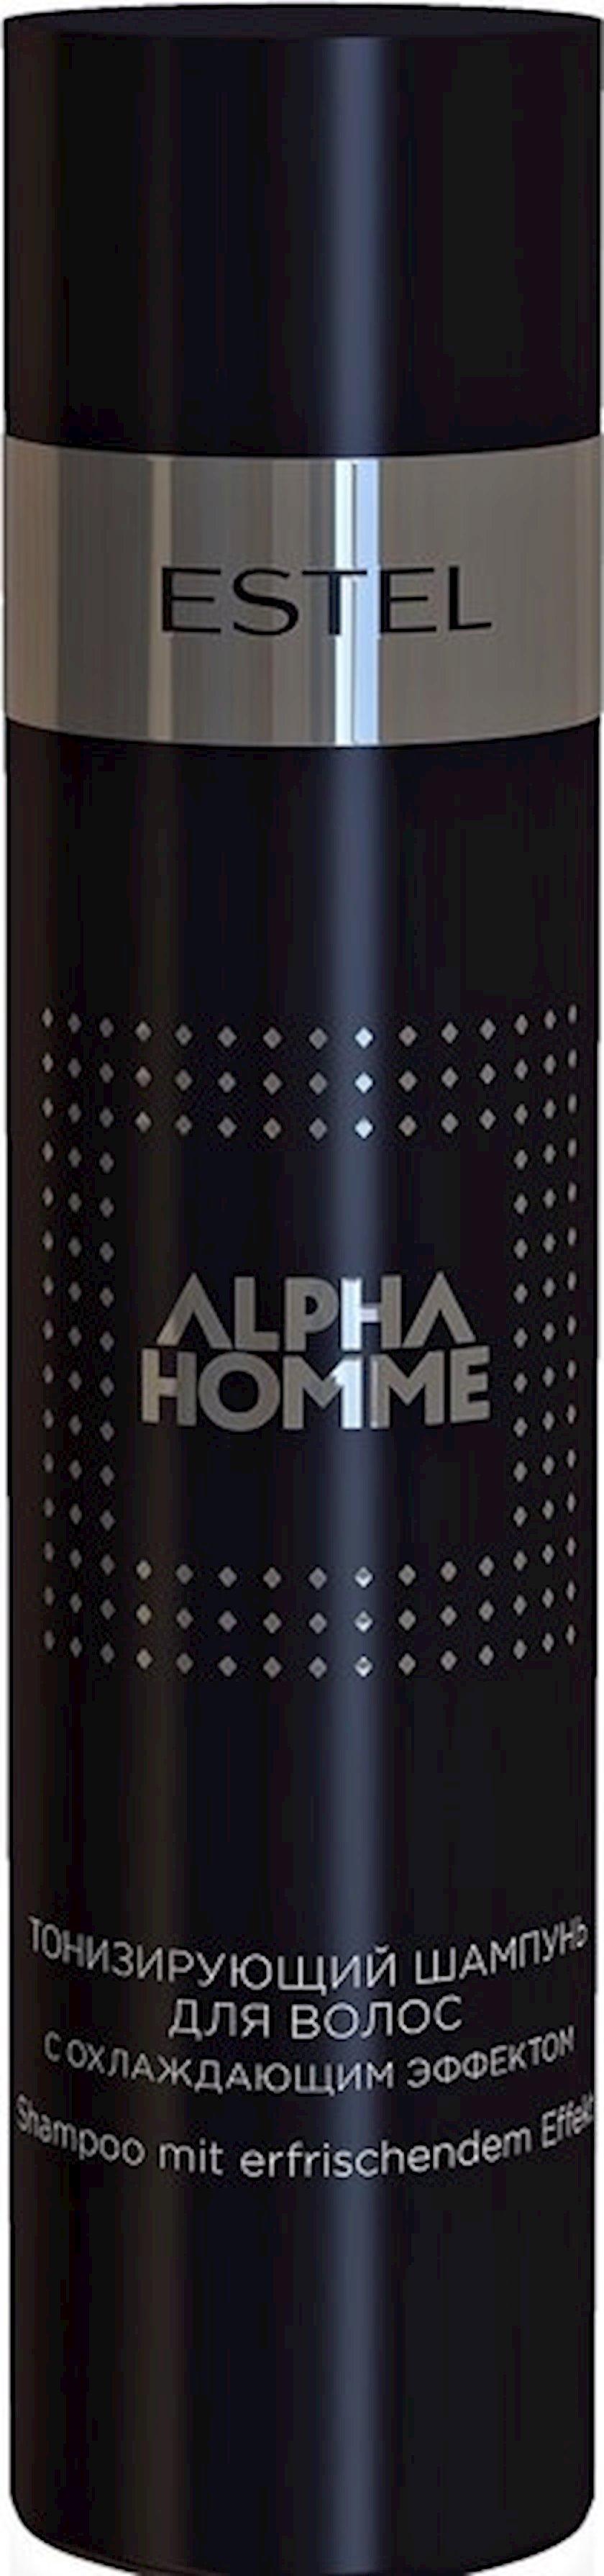 Şampun Estel Professional Alpha Homme sərinləşdirici effektli tonlaşdırıcı şampun 250 ml